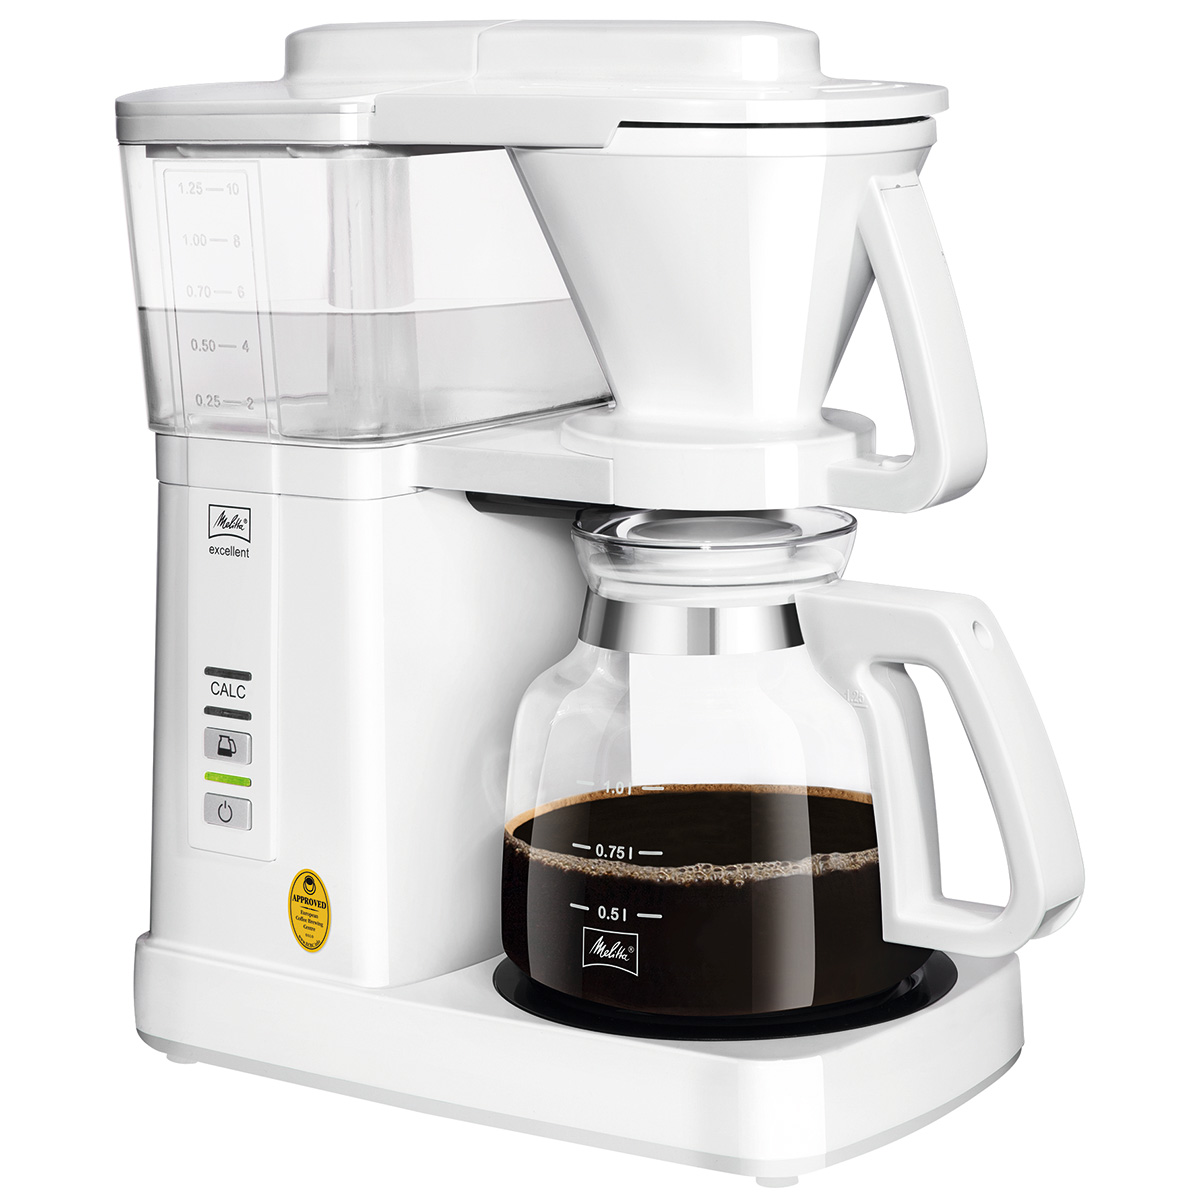 Melitta kaffemaskine - Excellent 5.0 - Hvid